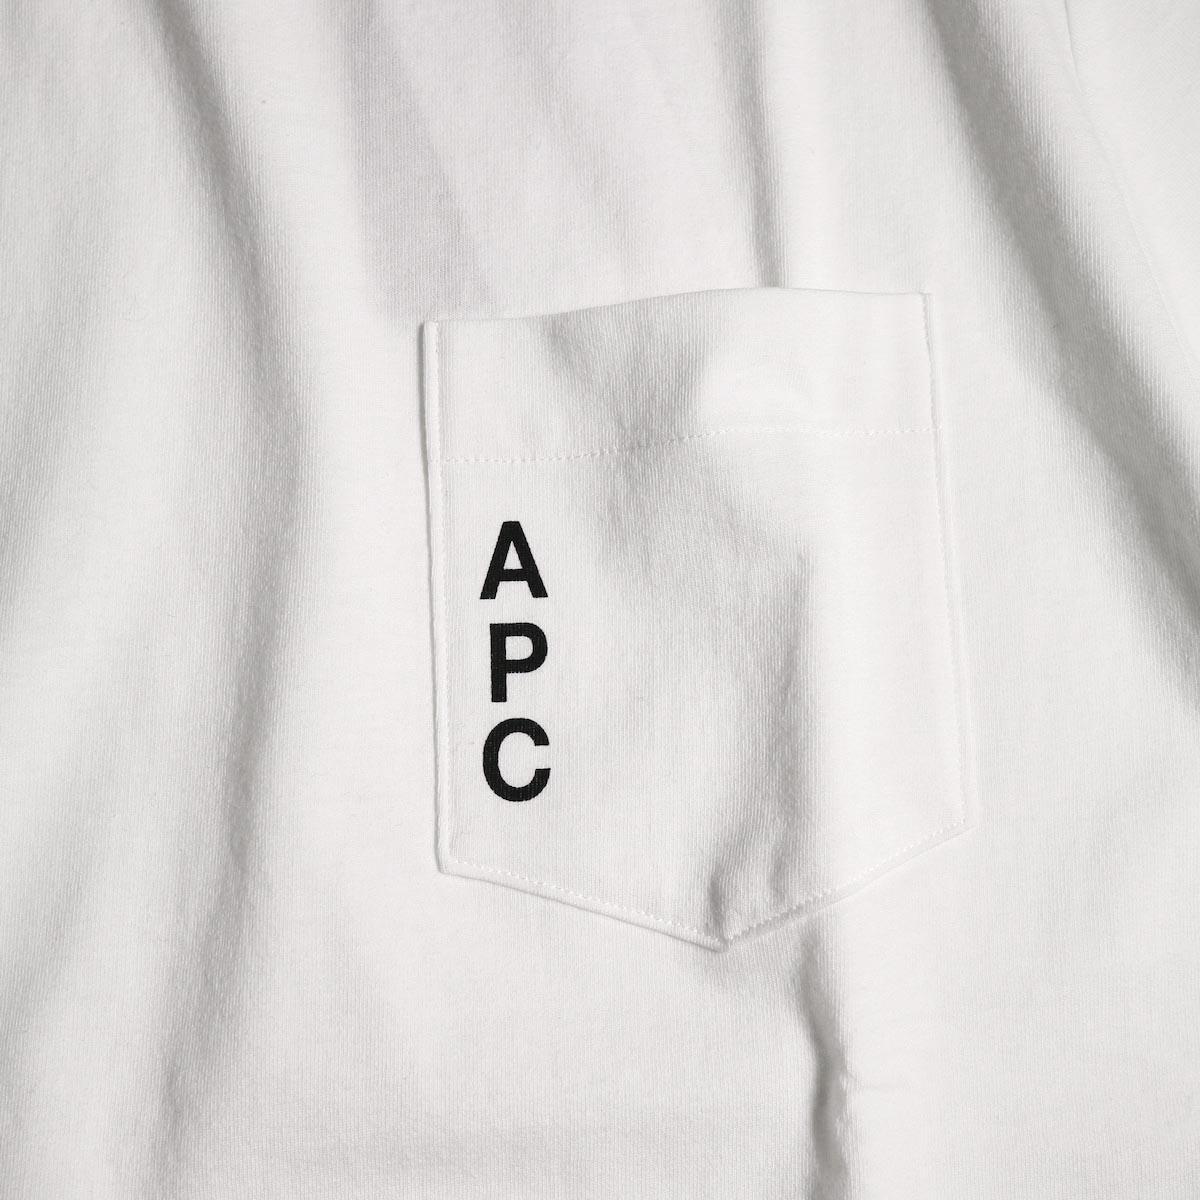 A.P.C. / Crew Neck Pocket Tee (White) ロゴ